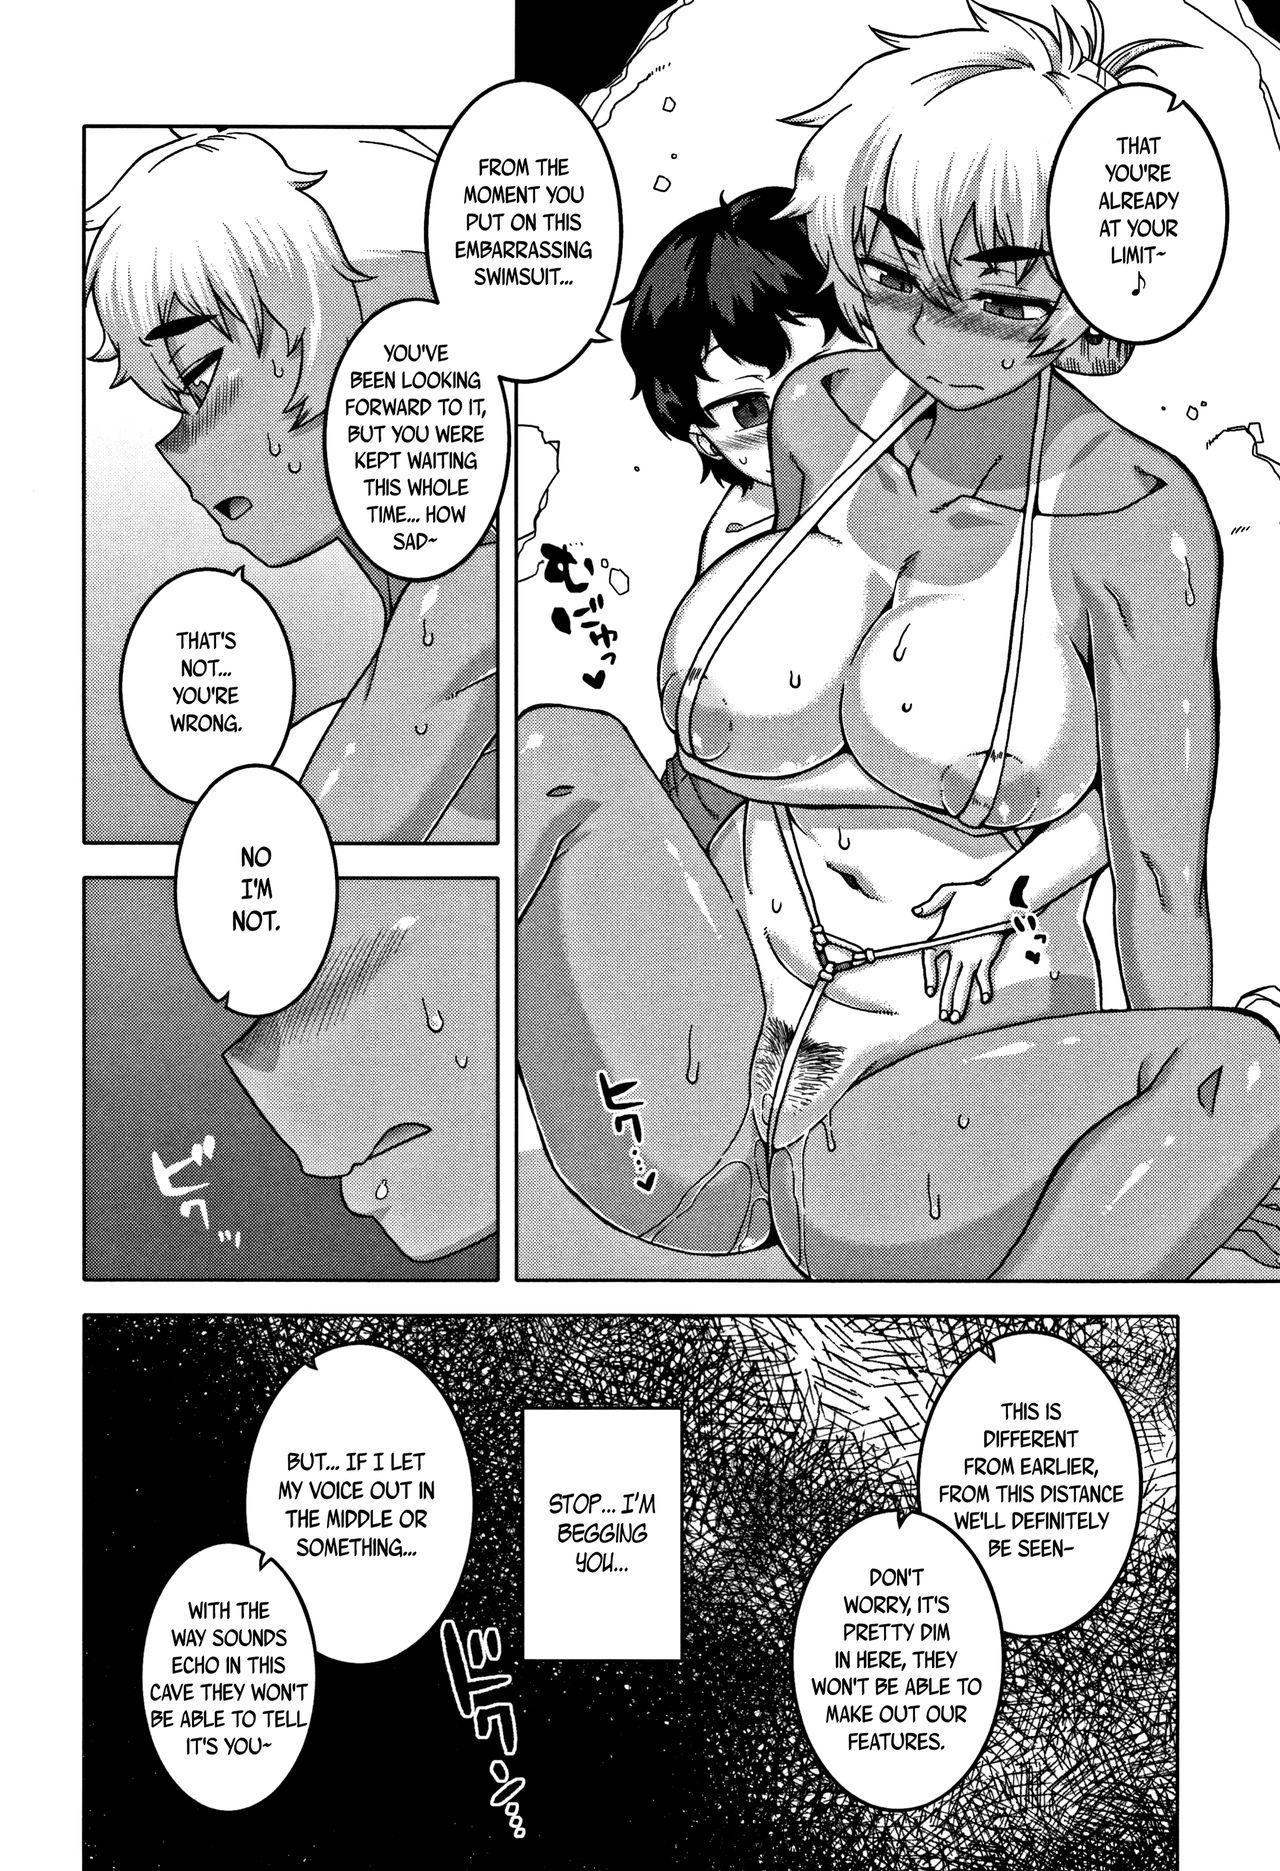 [Takatsu] Hitozuma A-san to Musuko no Yuujin N-kun - Married wife A and son's friend N-kun [English] 60